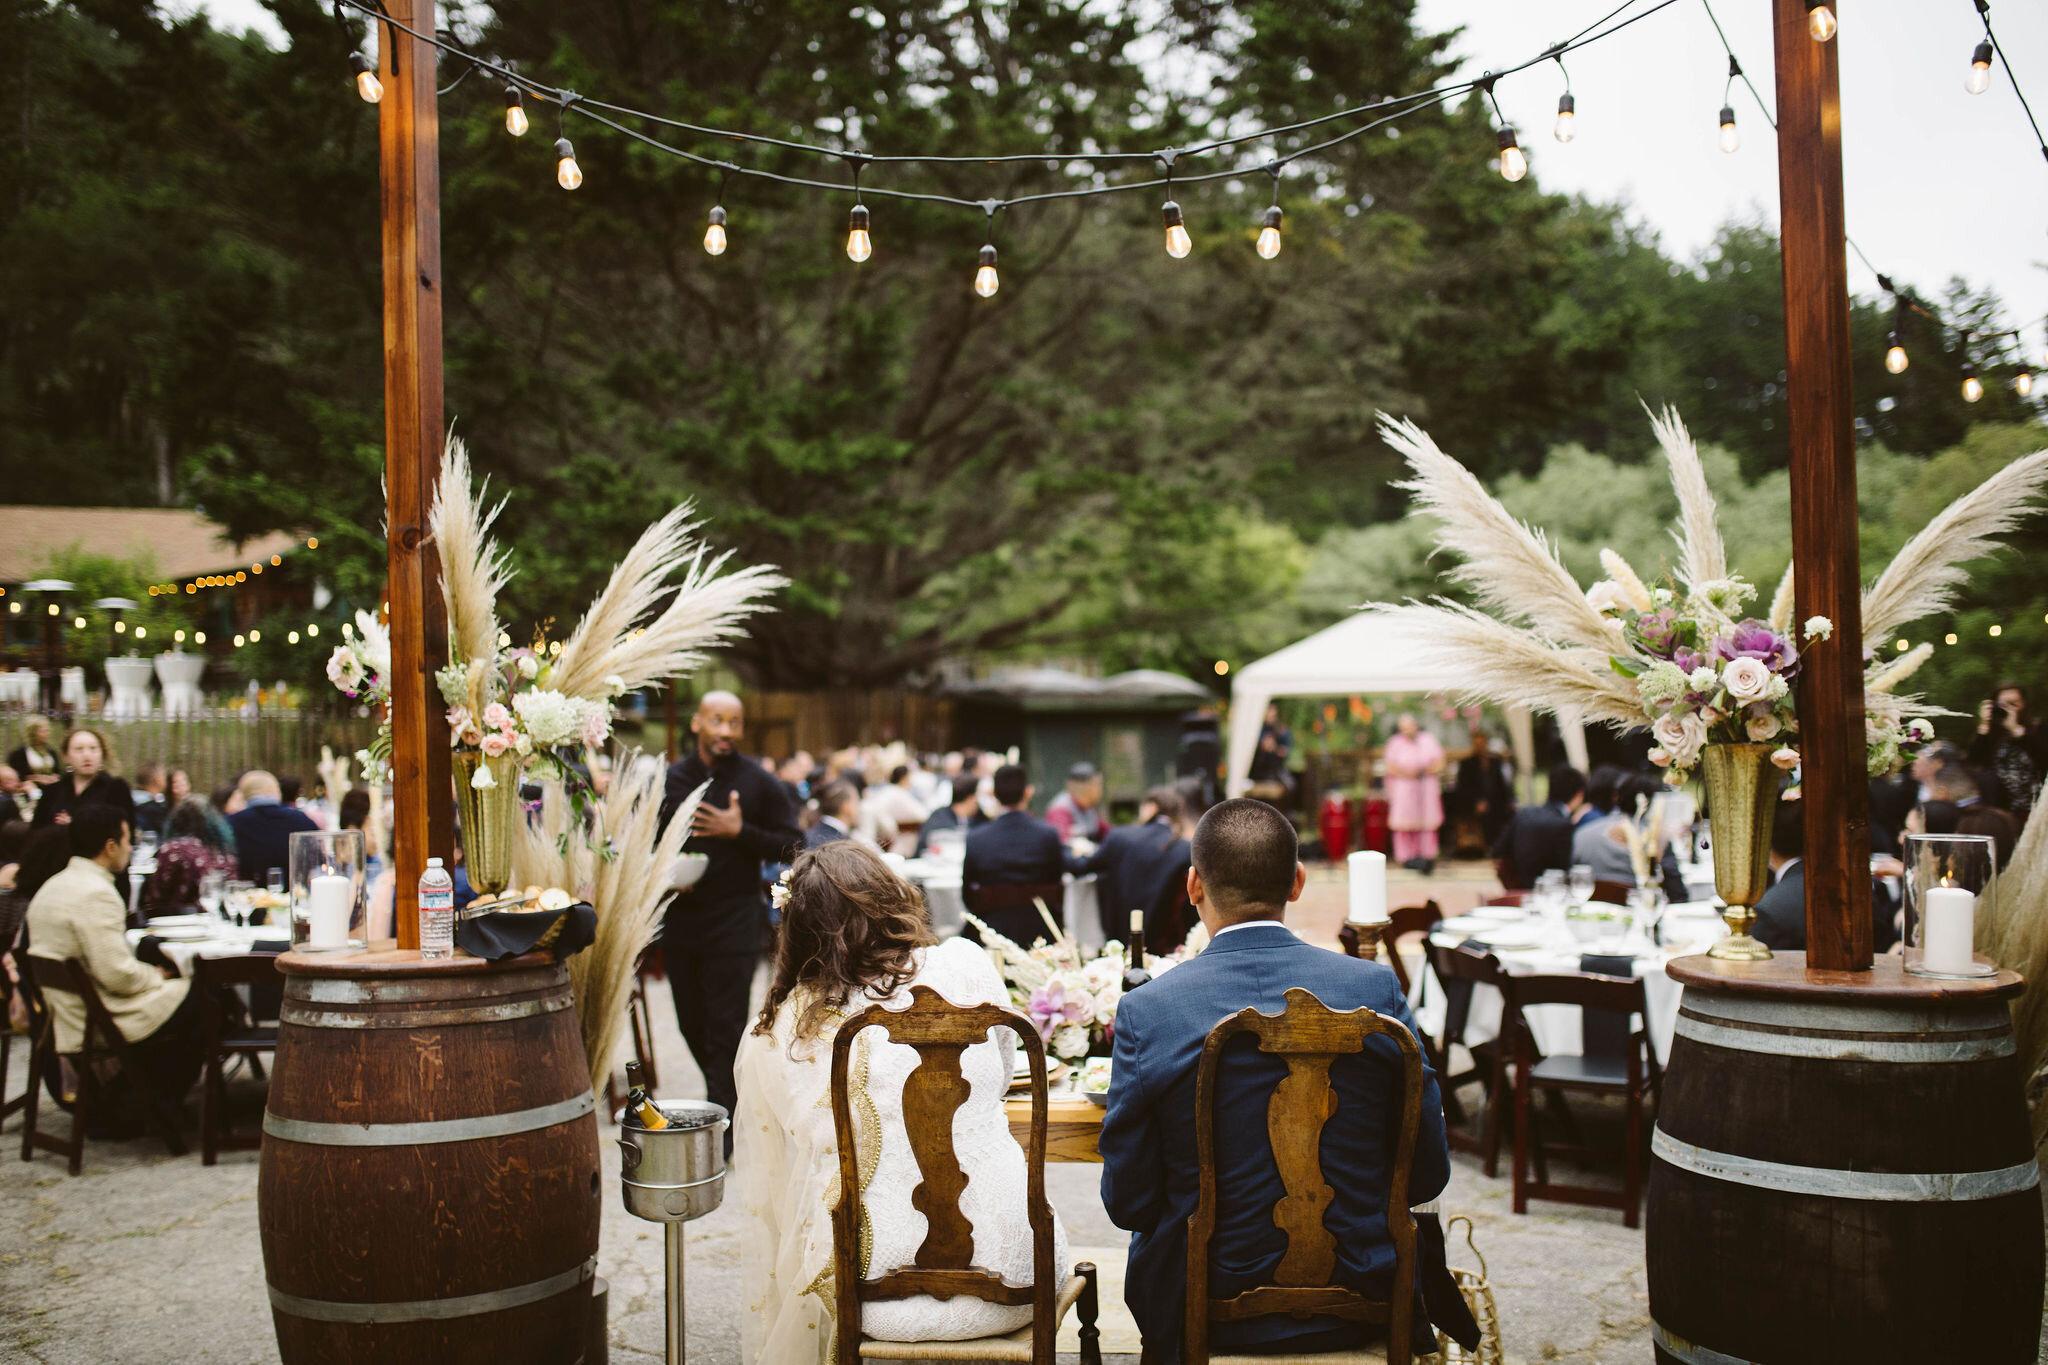 Venture-Retreat-Center-Wedding-Pescadero-Sat-Aaron-Pritam-The-Shalom-Imaginative-577.jpg